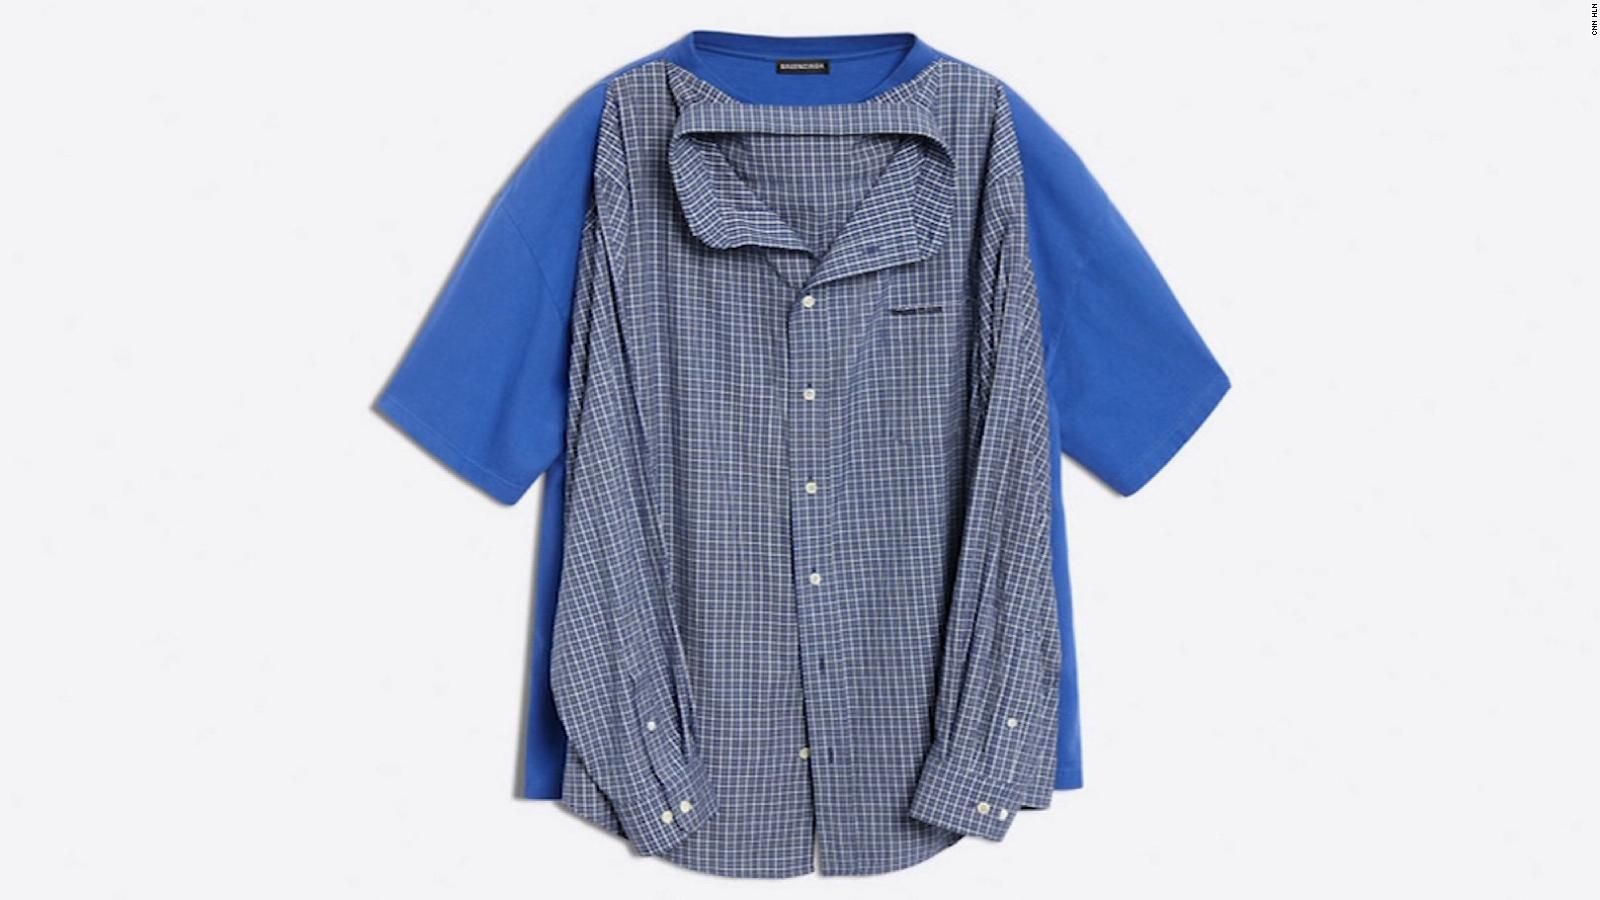 Luxury brand sells $1,300 T-shirt/shirt combo - CNN Video